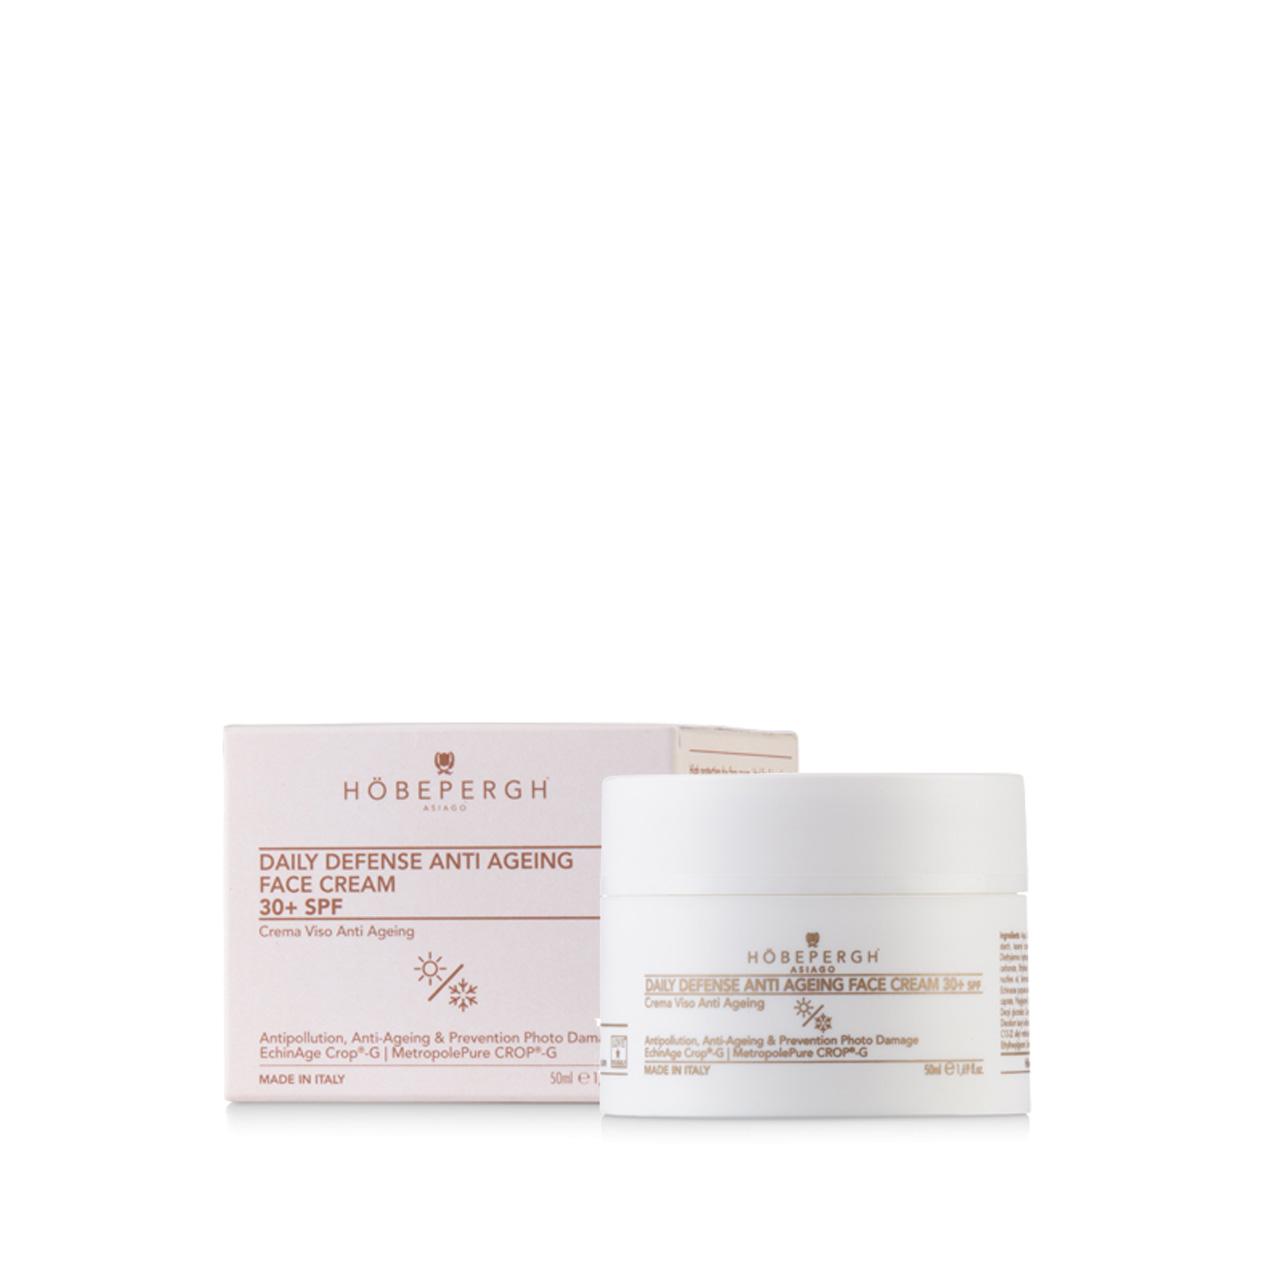 Daily Defense Anti Ageing Face Cream SPF 30+